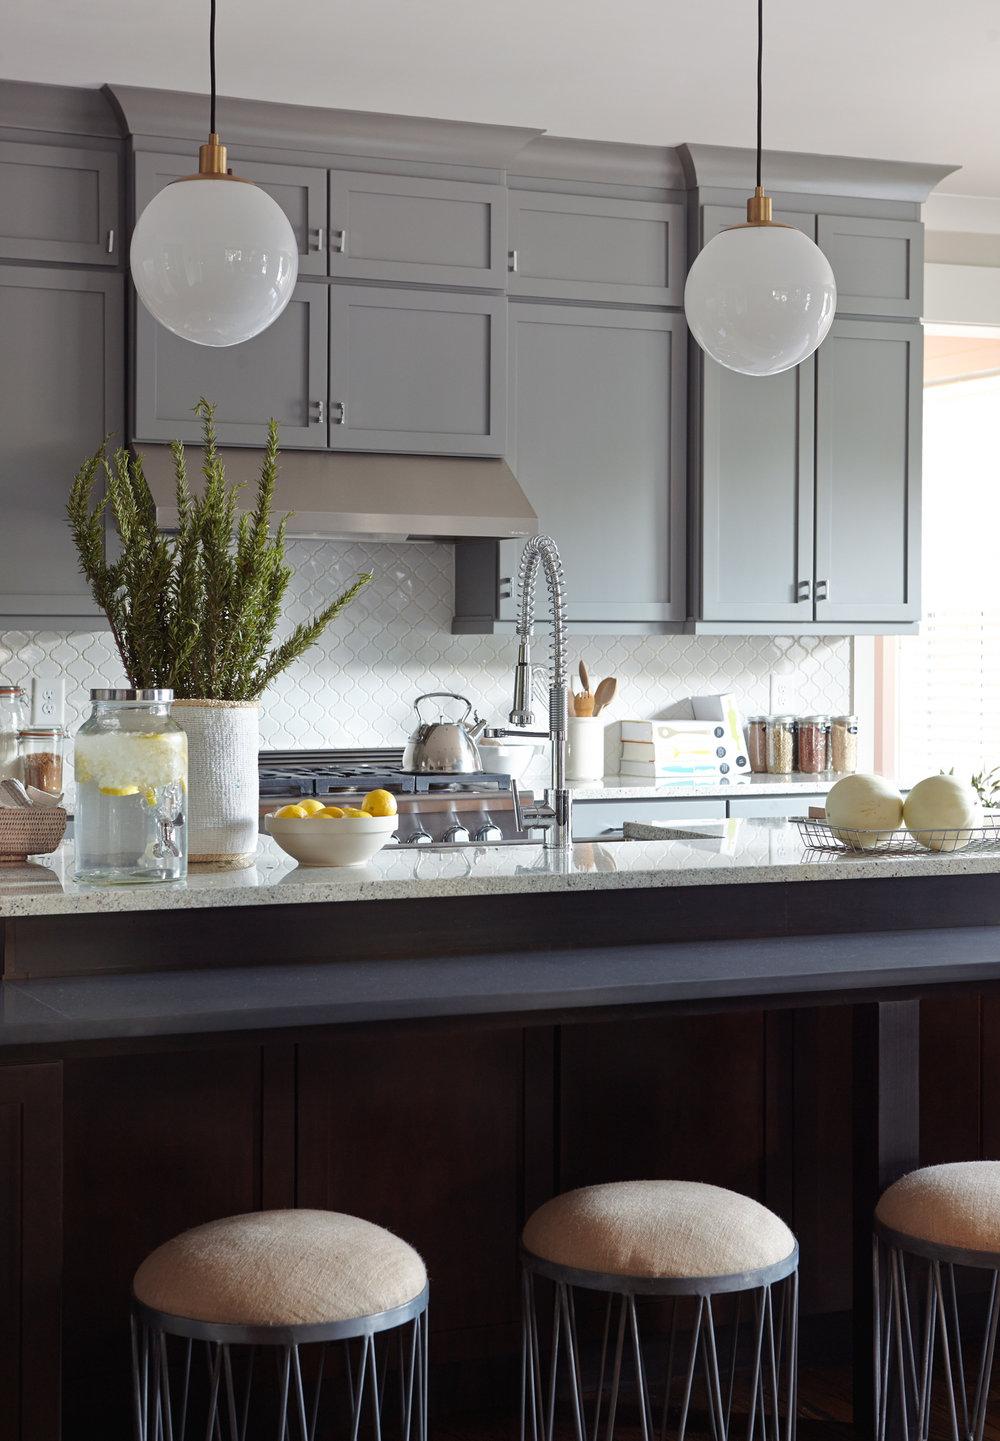 kitchen_paneled cabinets.jpg